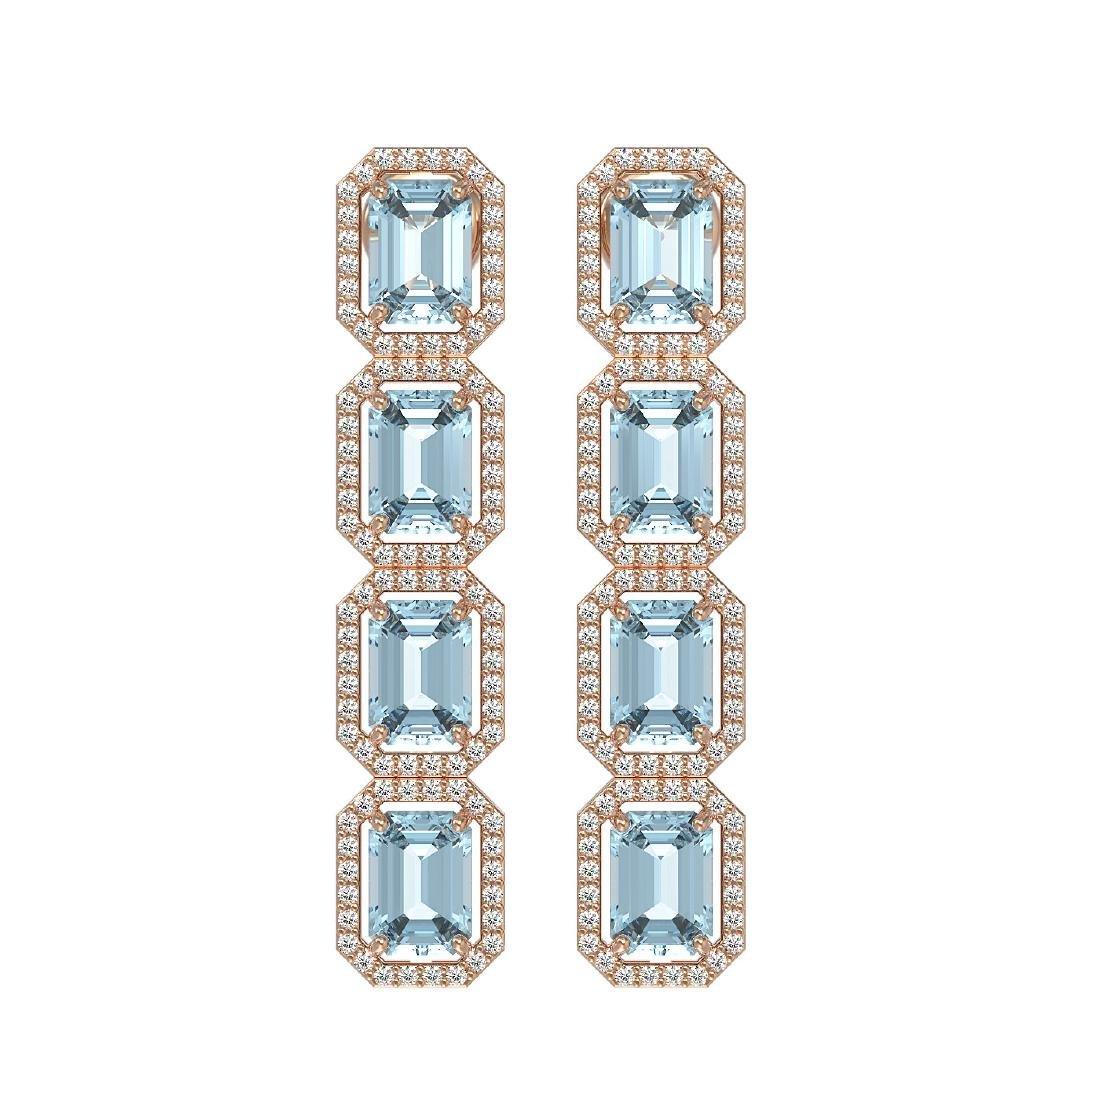 11.54 CTW Aquamarine & Diamond Halo Earrings 10K Rose